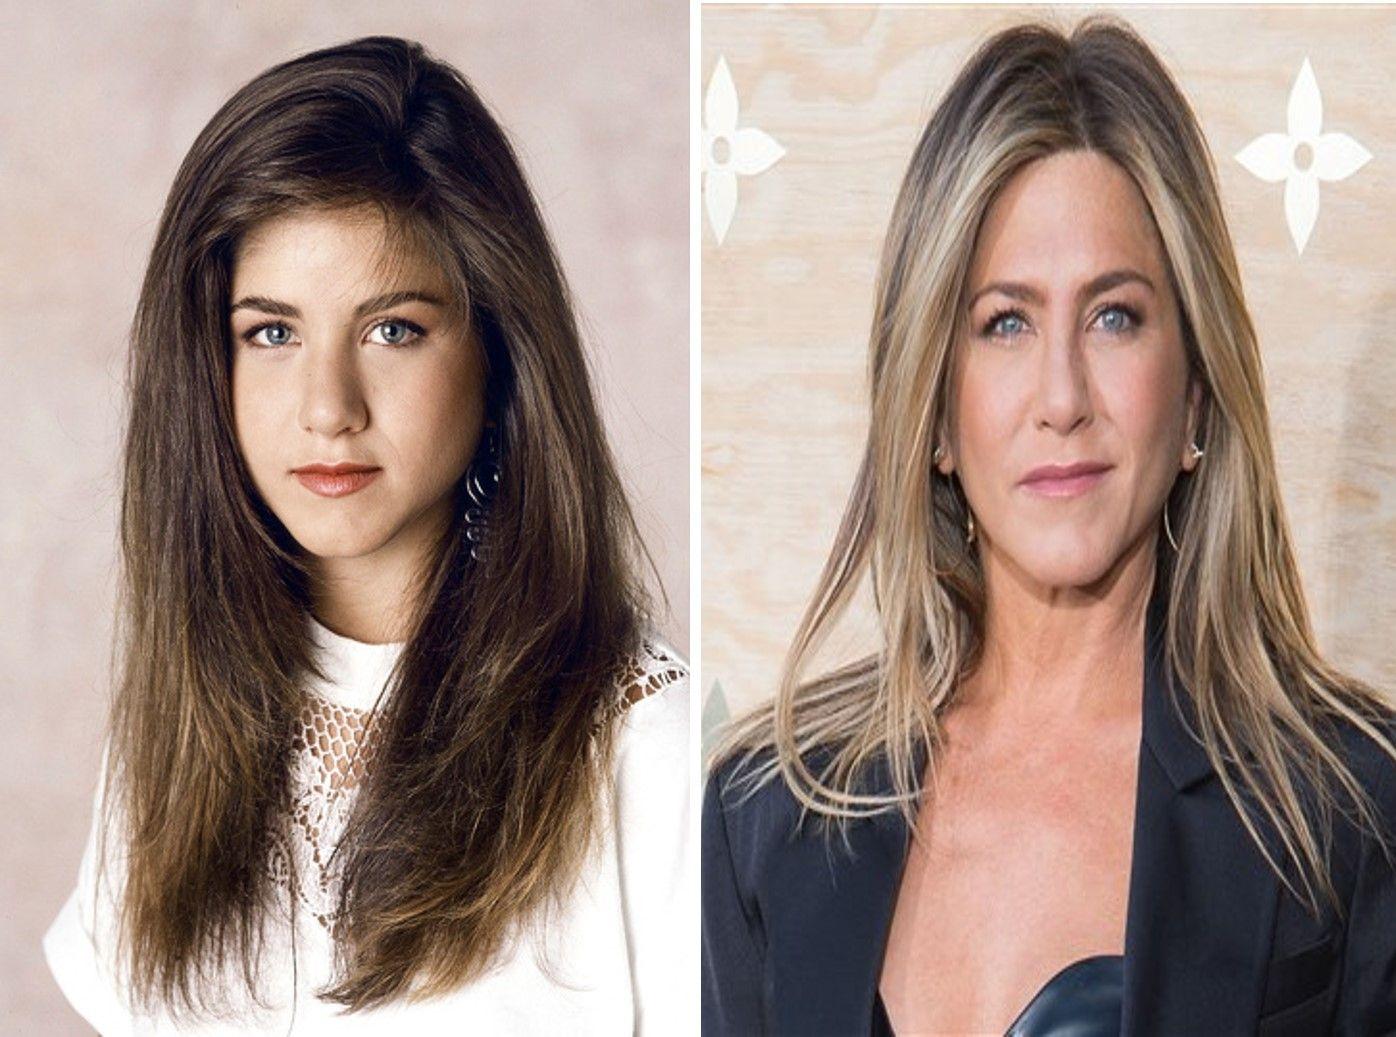 Jennifer Aniston Antes Y Después De Ser Una Actriz Muy Famosa Y Cotizada Famosos Aniston Jennifer Aniston